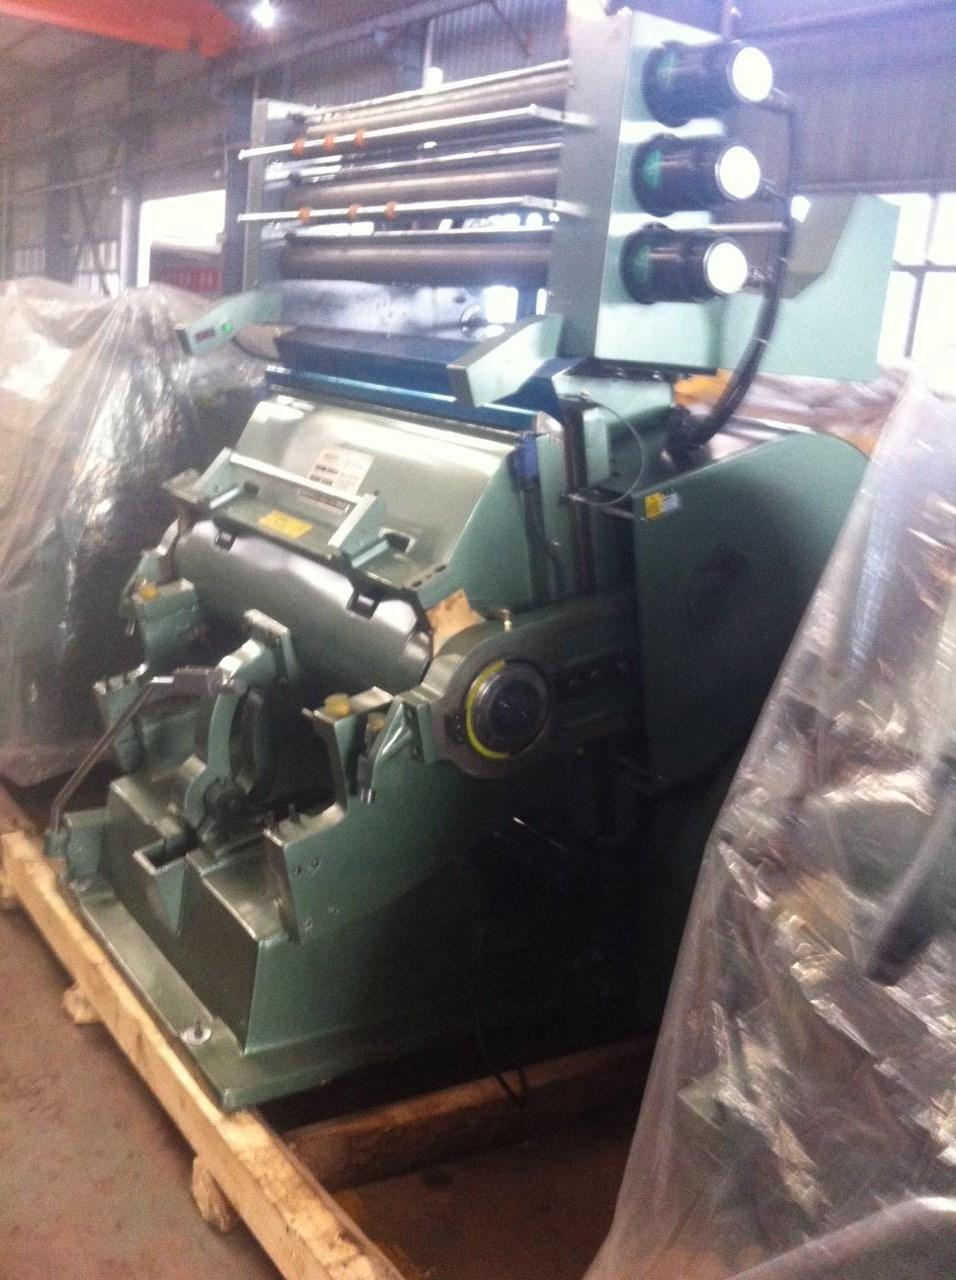 Tymk-1200 Hot Foil Stamping Machine & Die Cutting Machine